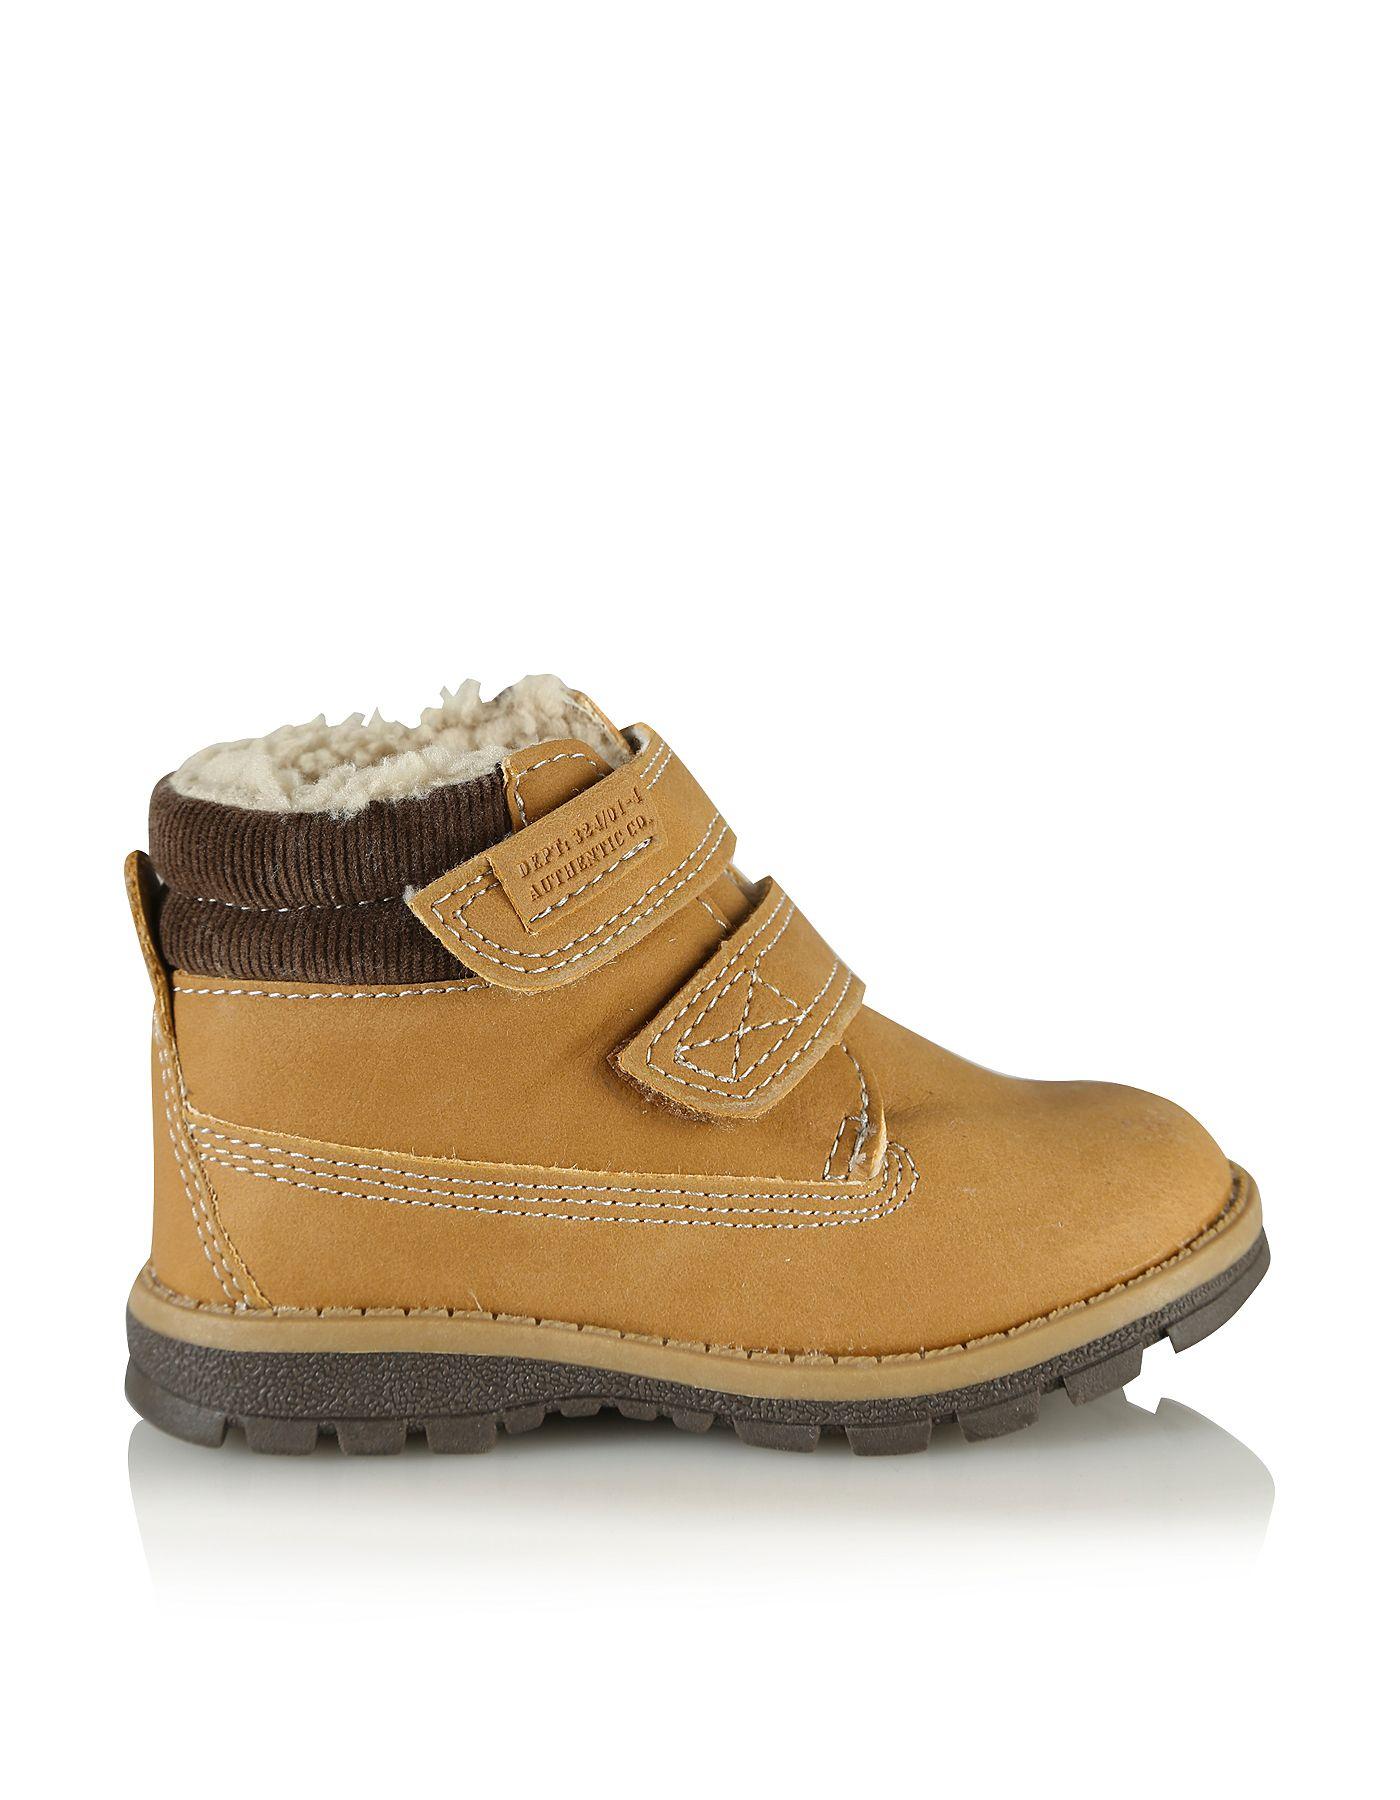 Rugged Boots | Boys | George at ASDA